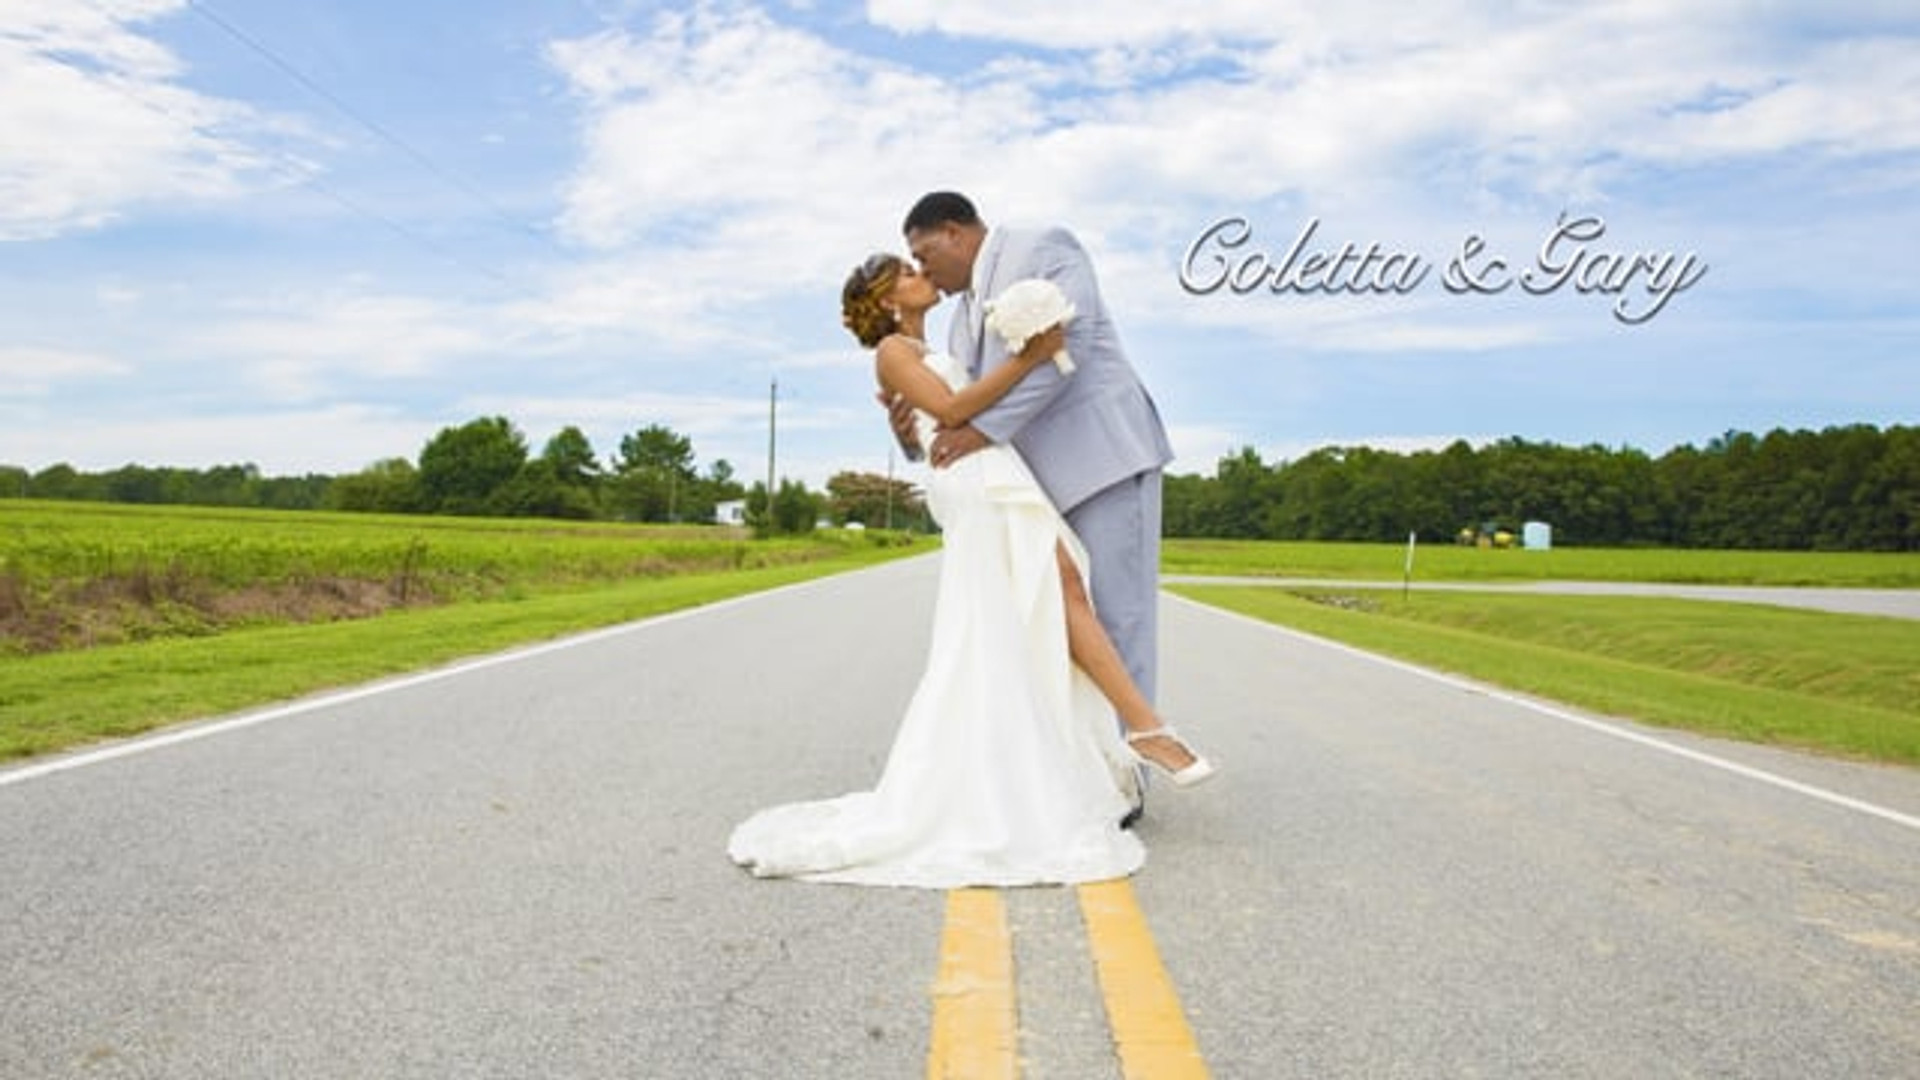 Coletta & Gary